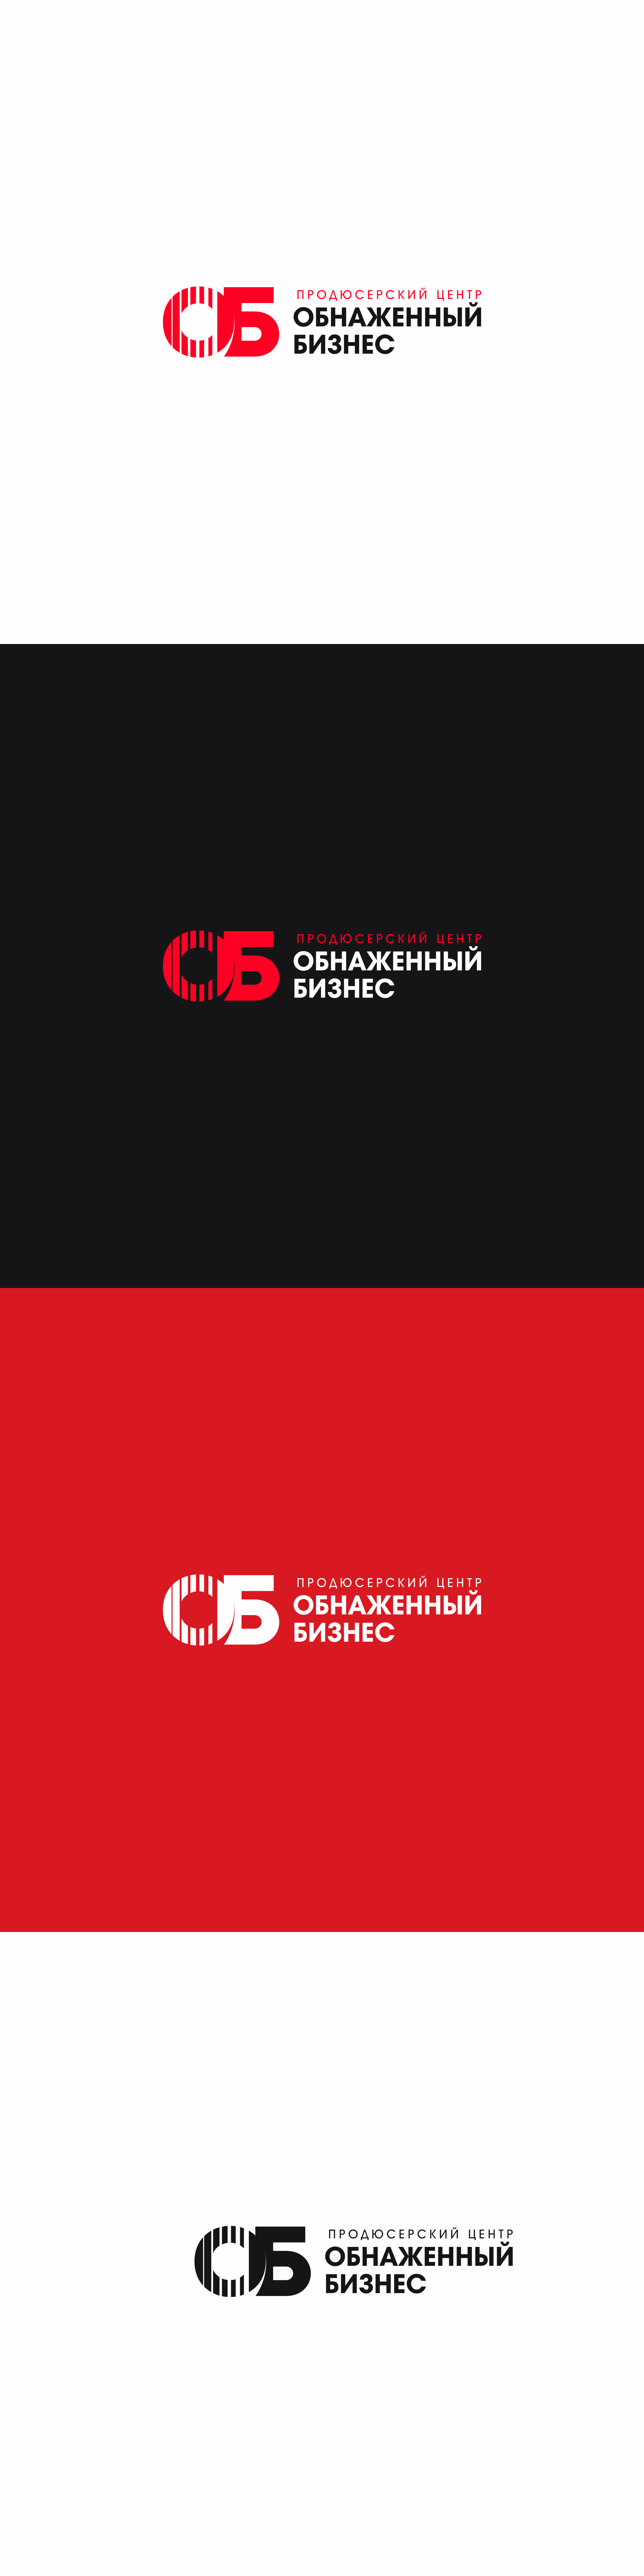 "Логотип для продюсерского центра ""Обнажённый бизнес"" фото f_9185ba21f4d8e85c.jpg"